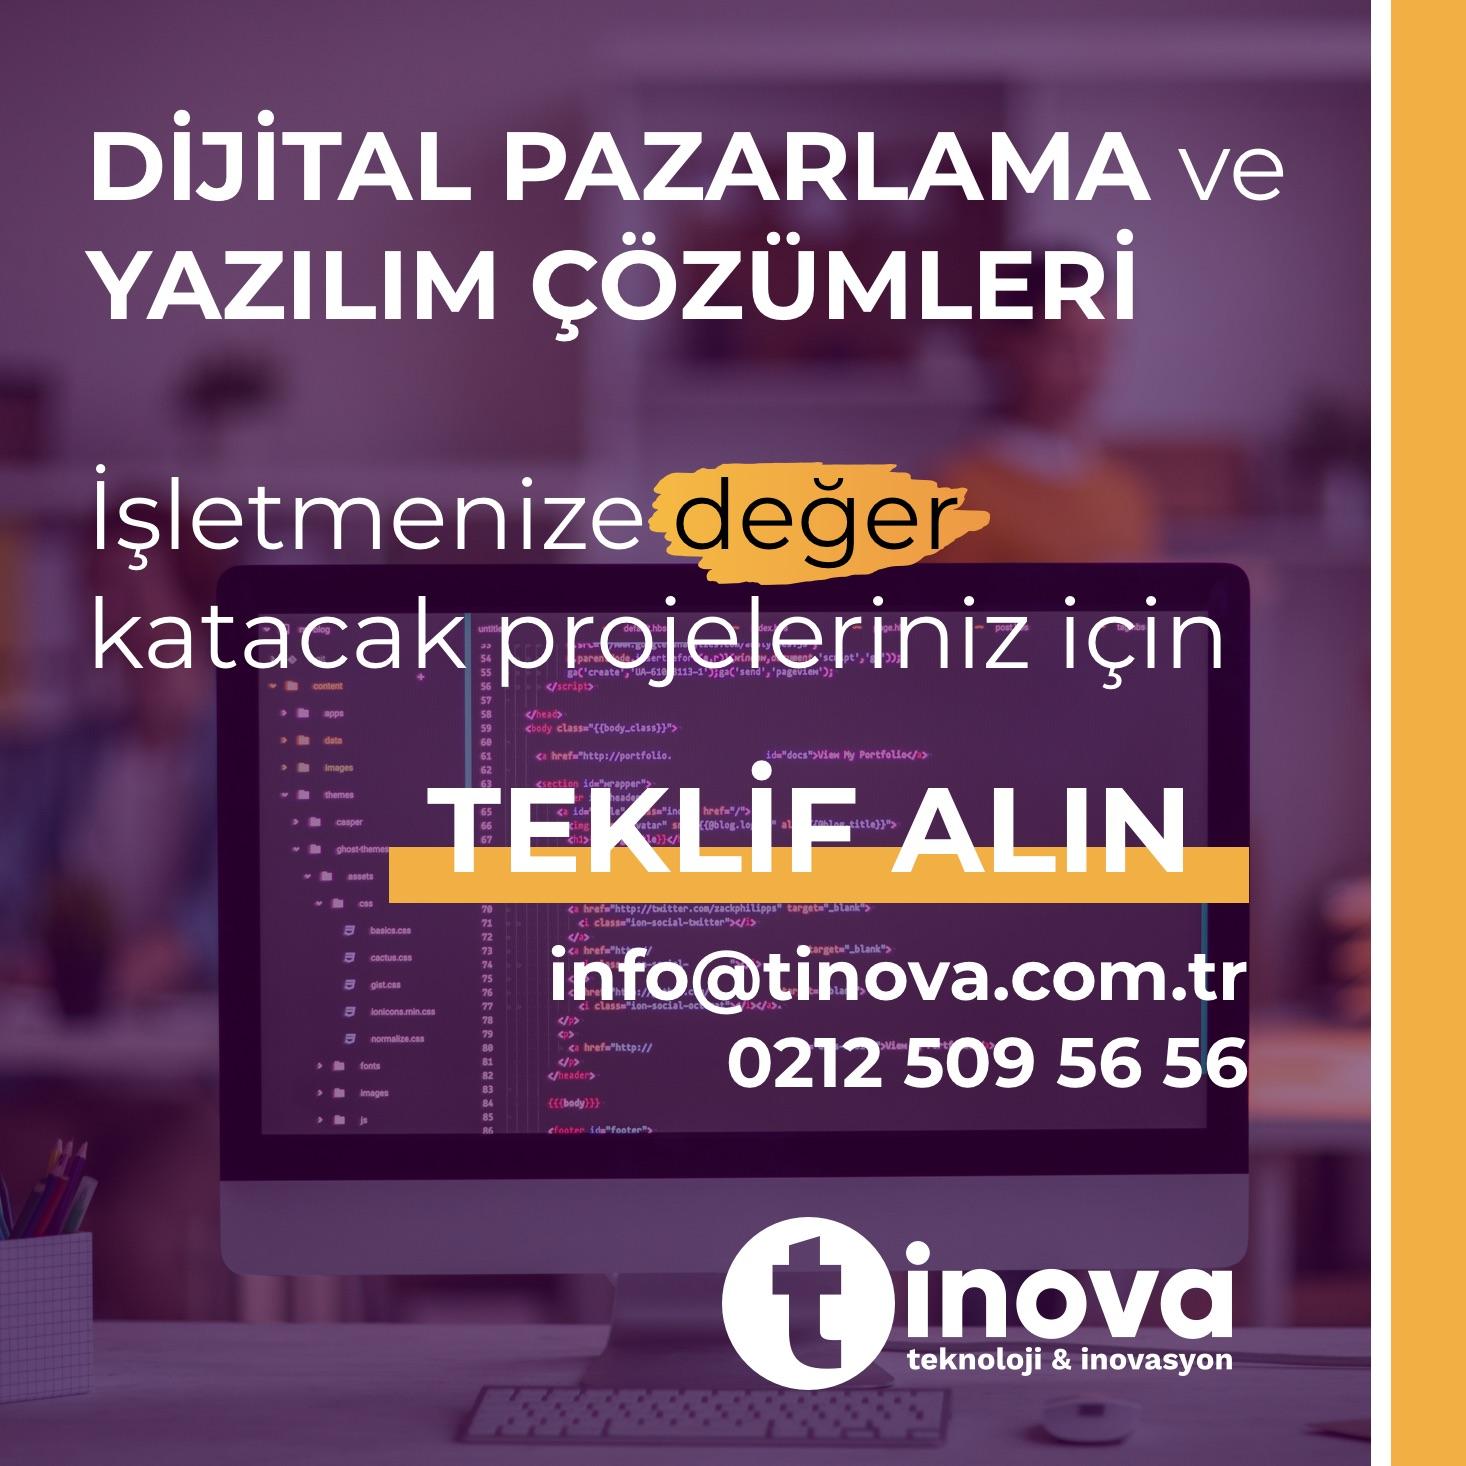 http://www.tedarikzinciri.org/wp-content/uploads/2020/03/tinova_yazilim_cozumleri.jpg